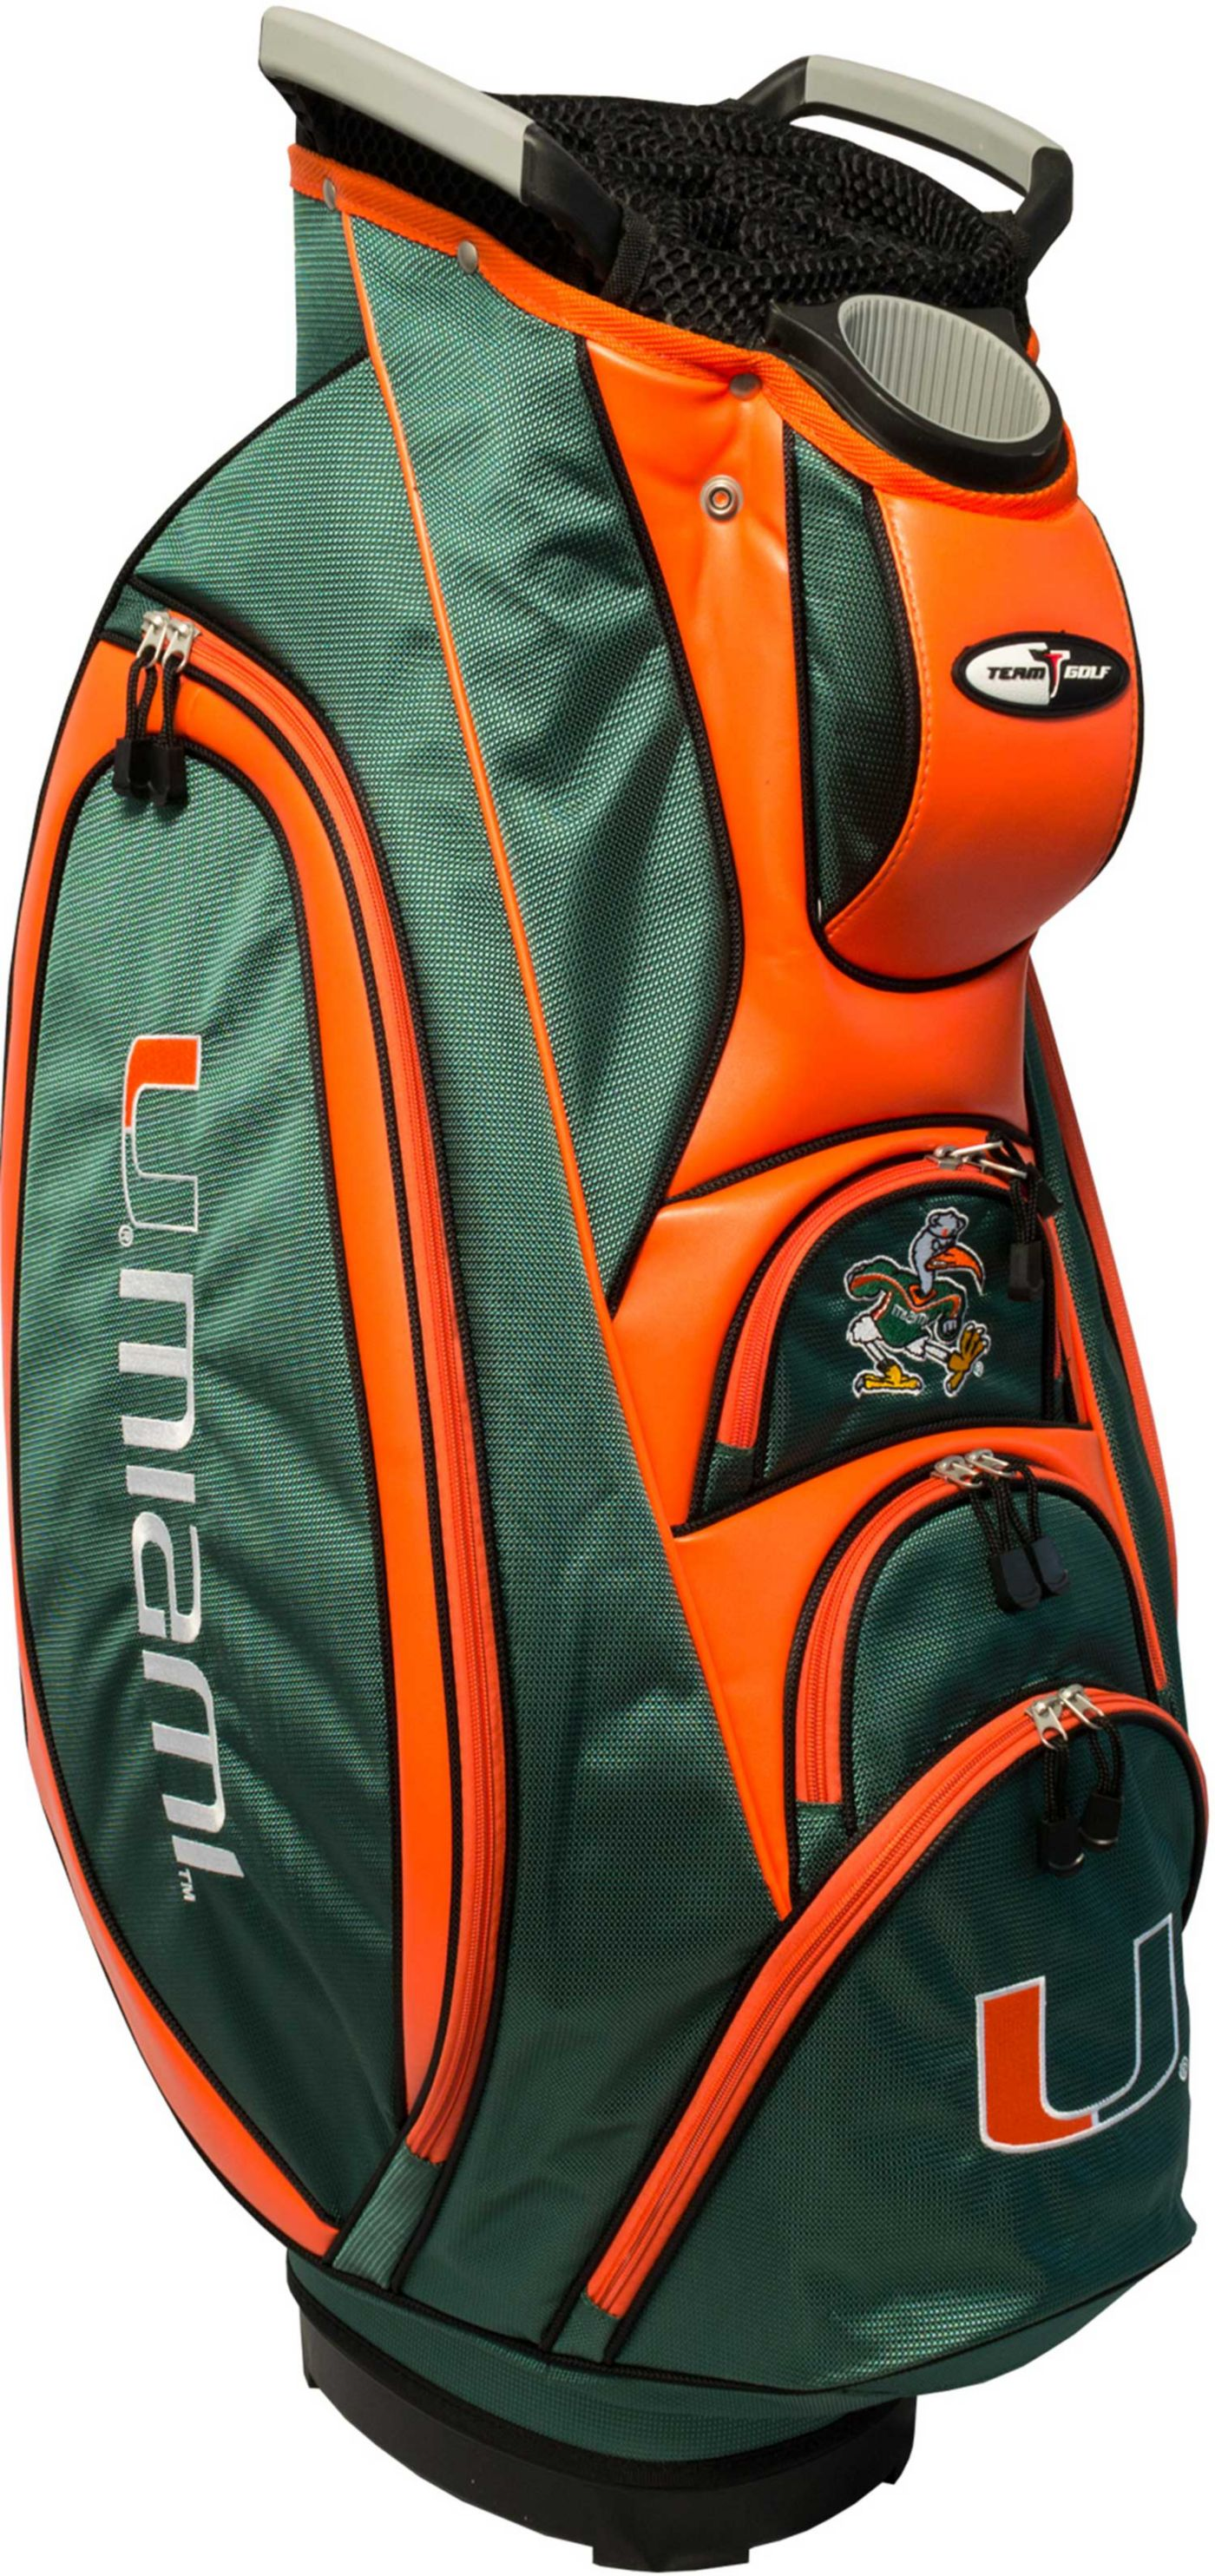 Team Golf Victory Miami Hurricanes Cart Bag